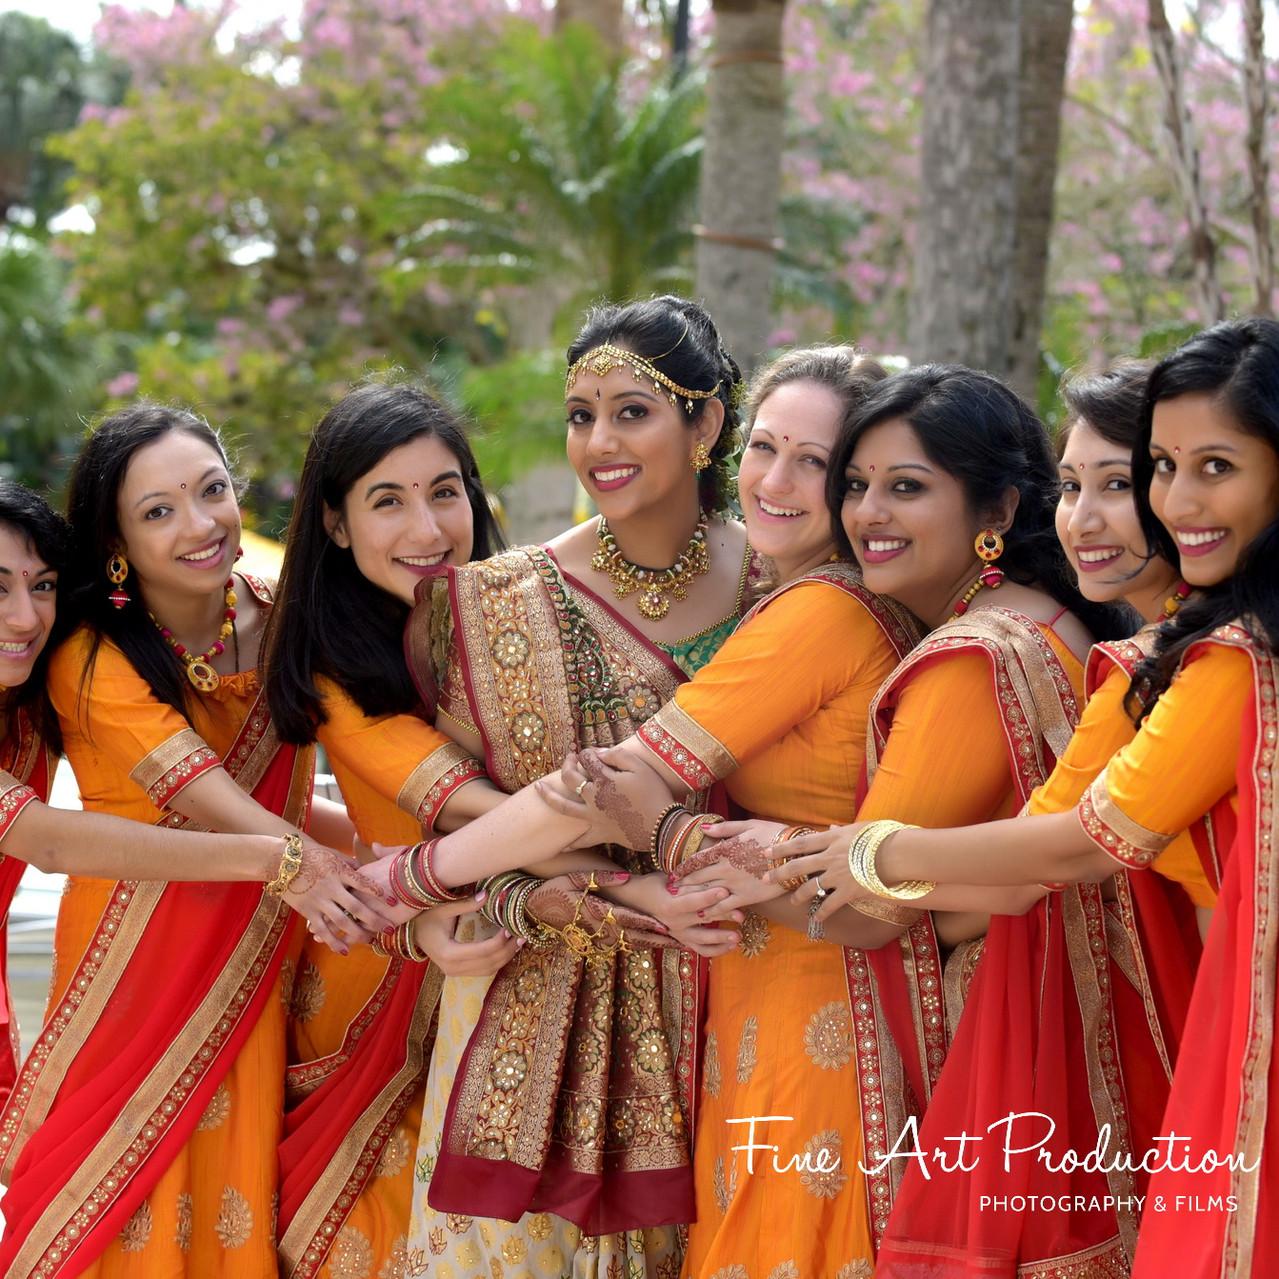 Hyatt-Regency-Grand-Cypress-Indian-Wedding-Photography-Fine-Art-Production-Amish-Thakkar_28